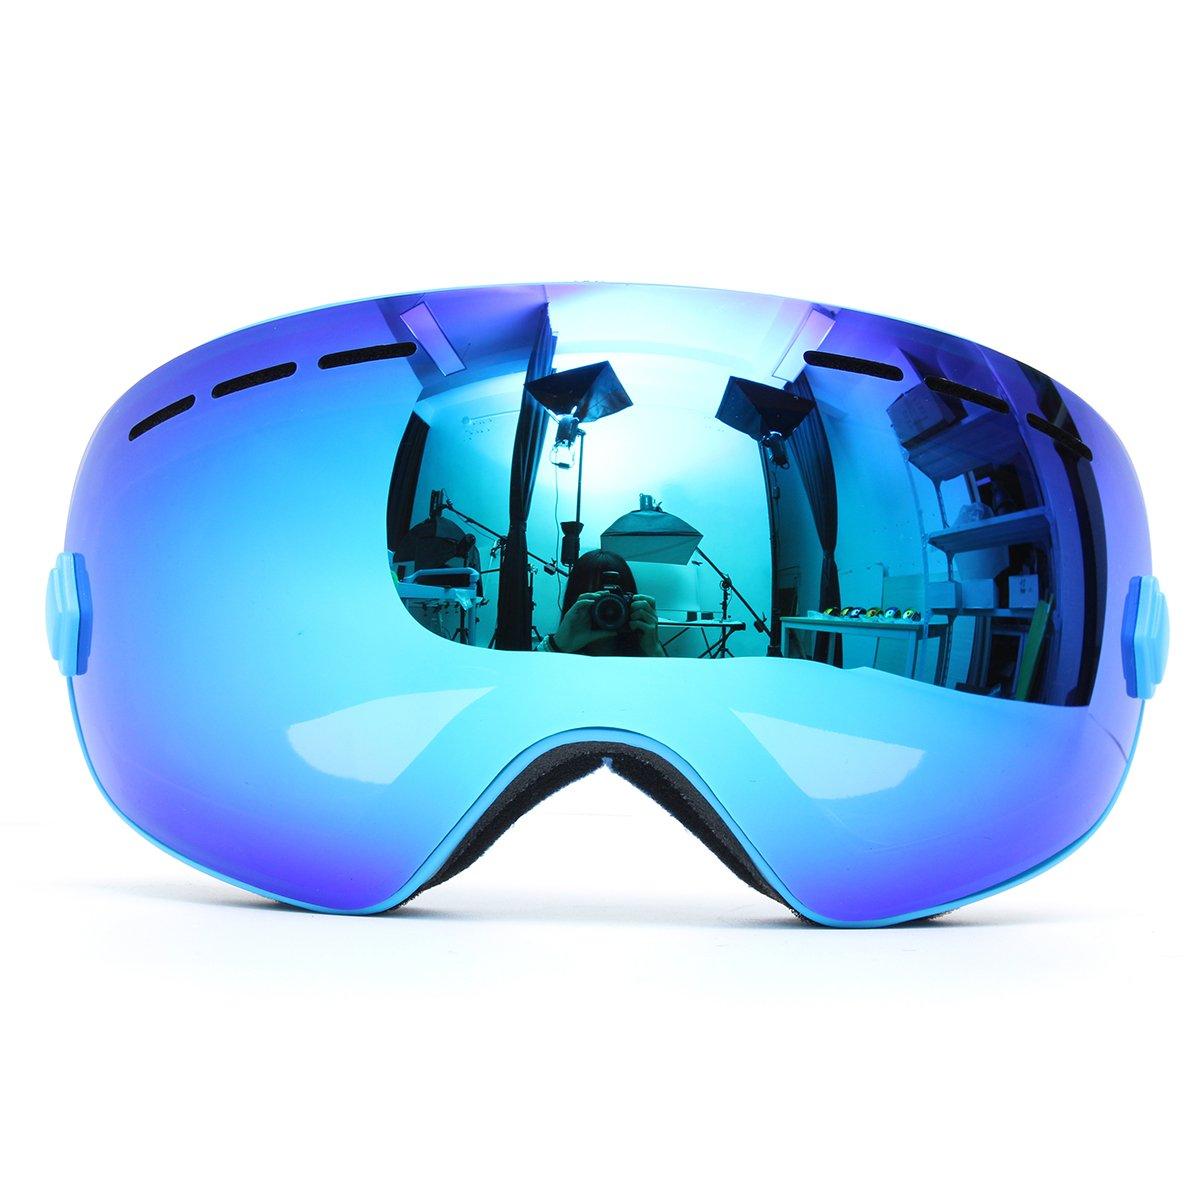 Viviance Profi-Skifahren Motorrad-Snowboardski-Bikegleinert Anti Nebel Uv-Doppel-Lens Blau